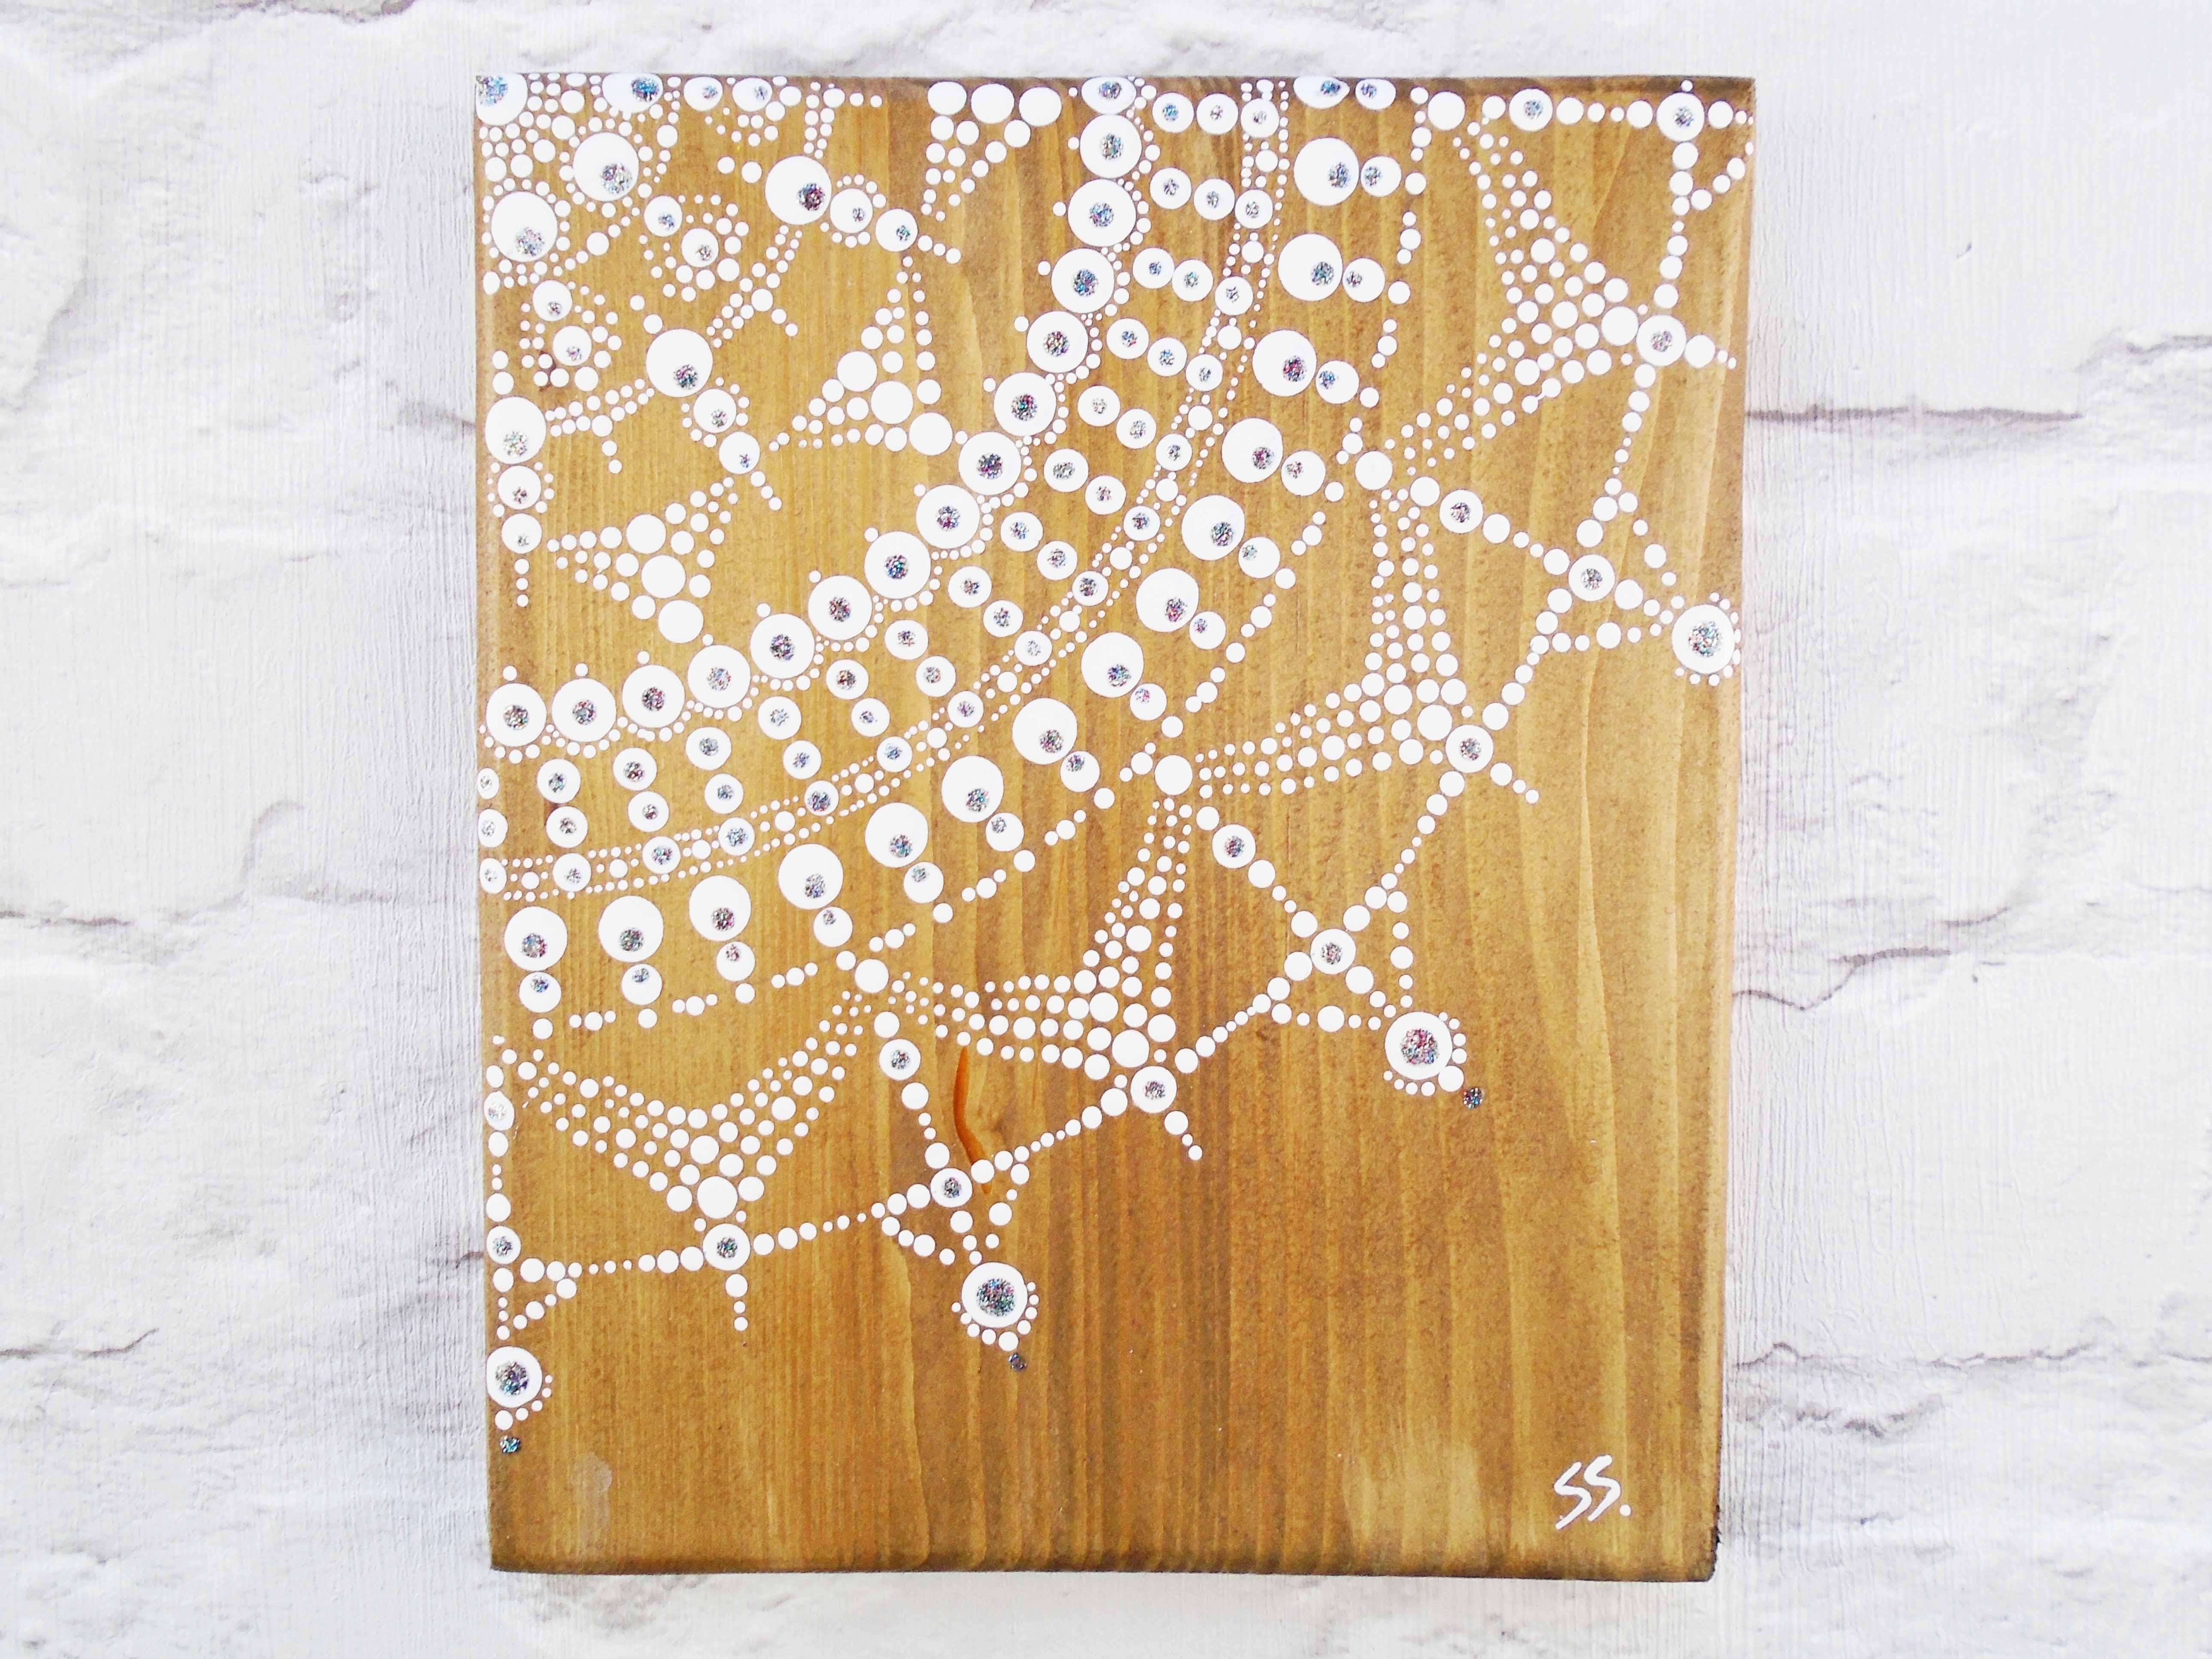 Rustic Mandala Wall Art | White Mandala On Rustic Wood | Dot Art Within Recent Mandala Wall Art (View 19 of 20)